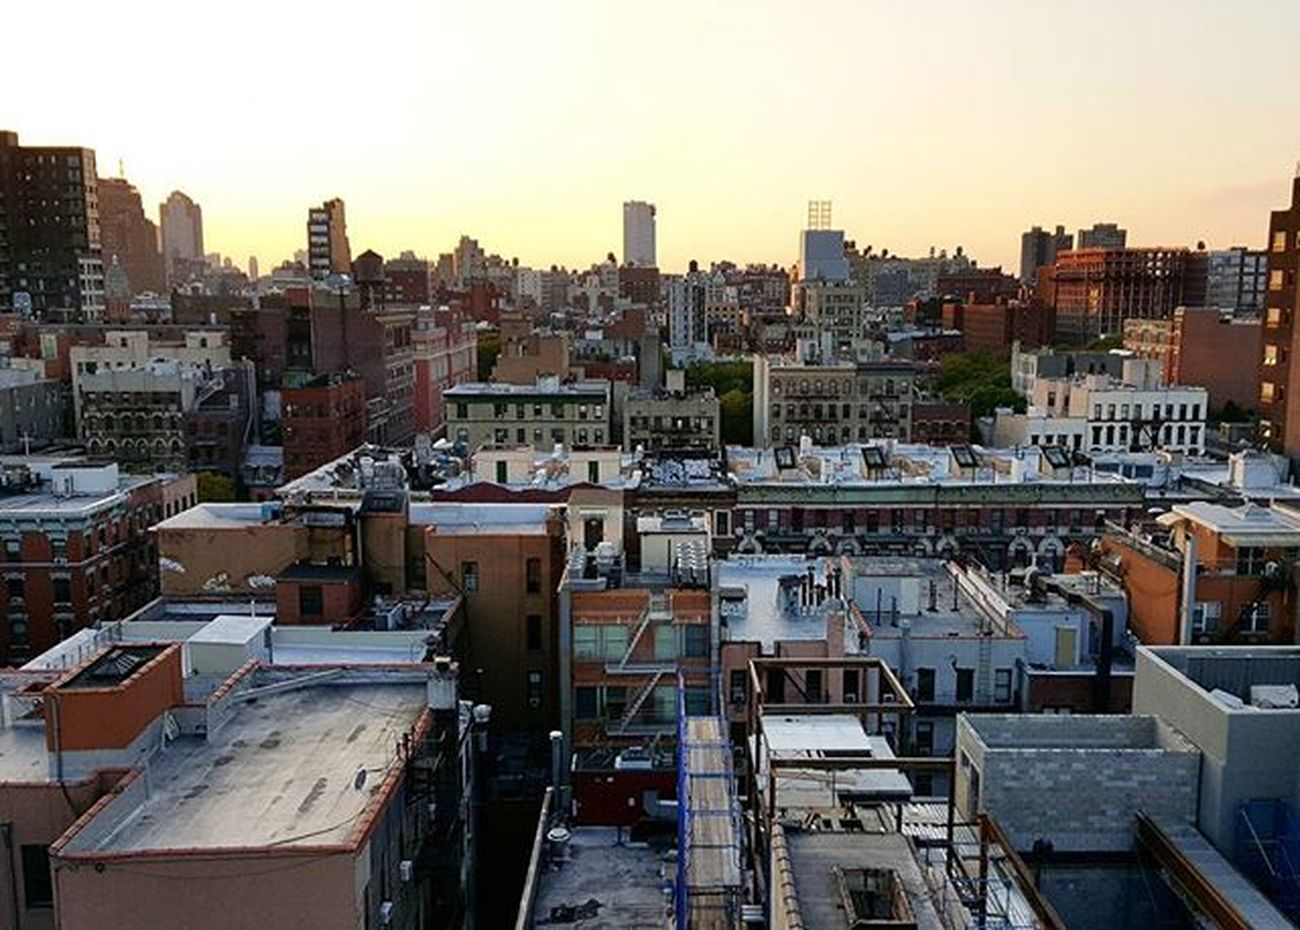 🔝 Ignyc Igny Newyorkcity NYC Newyork Streetphotography Peoplescreative Gameoftones Illgrammers Shoot2kill Justgoshoot Instagood Cityliving Vscocam Vscogram Rooftop Lowereastside LES